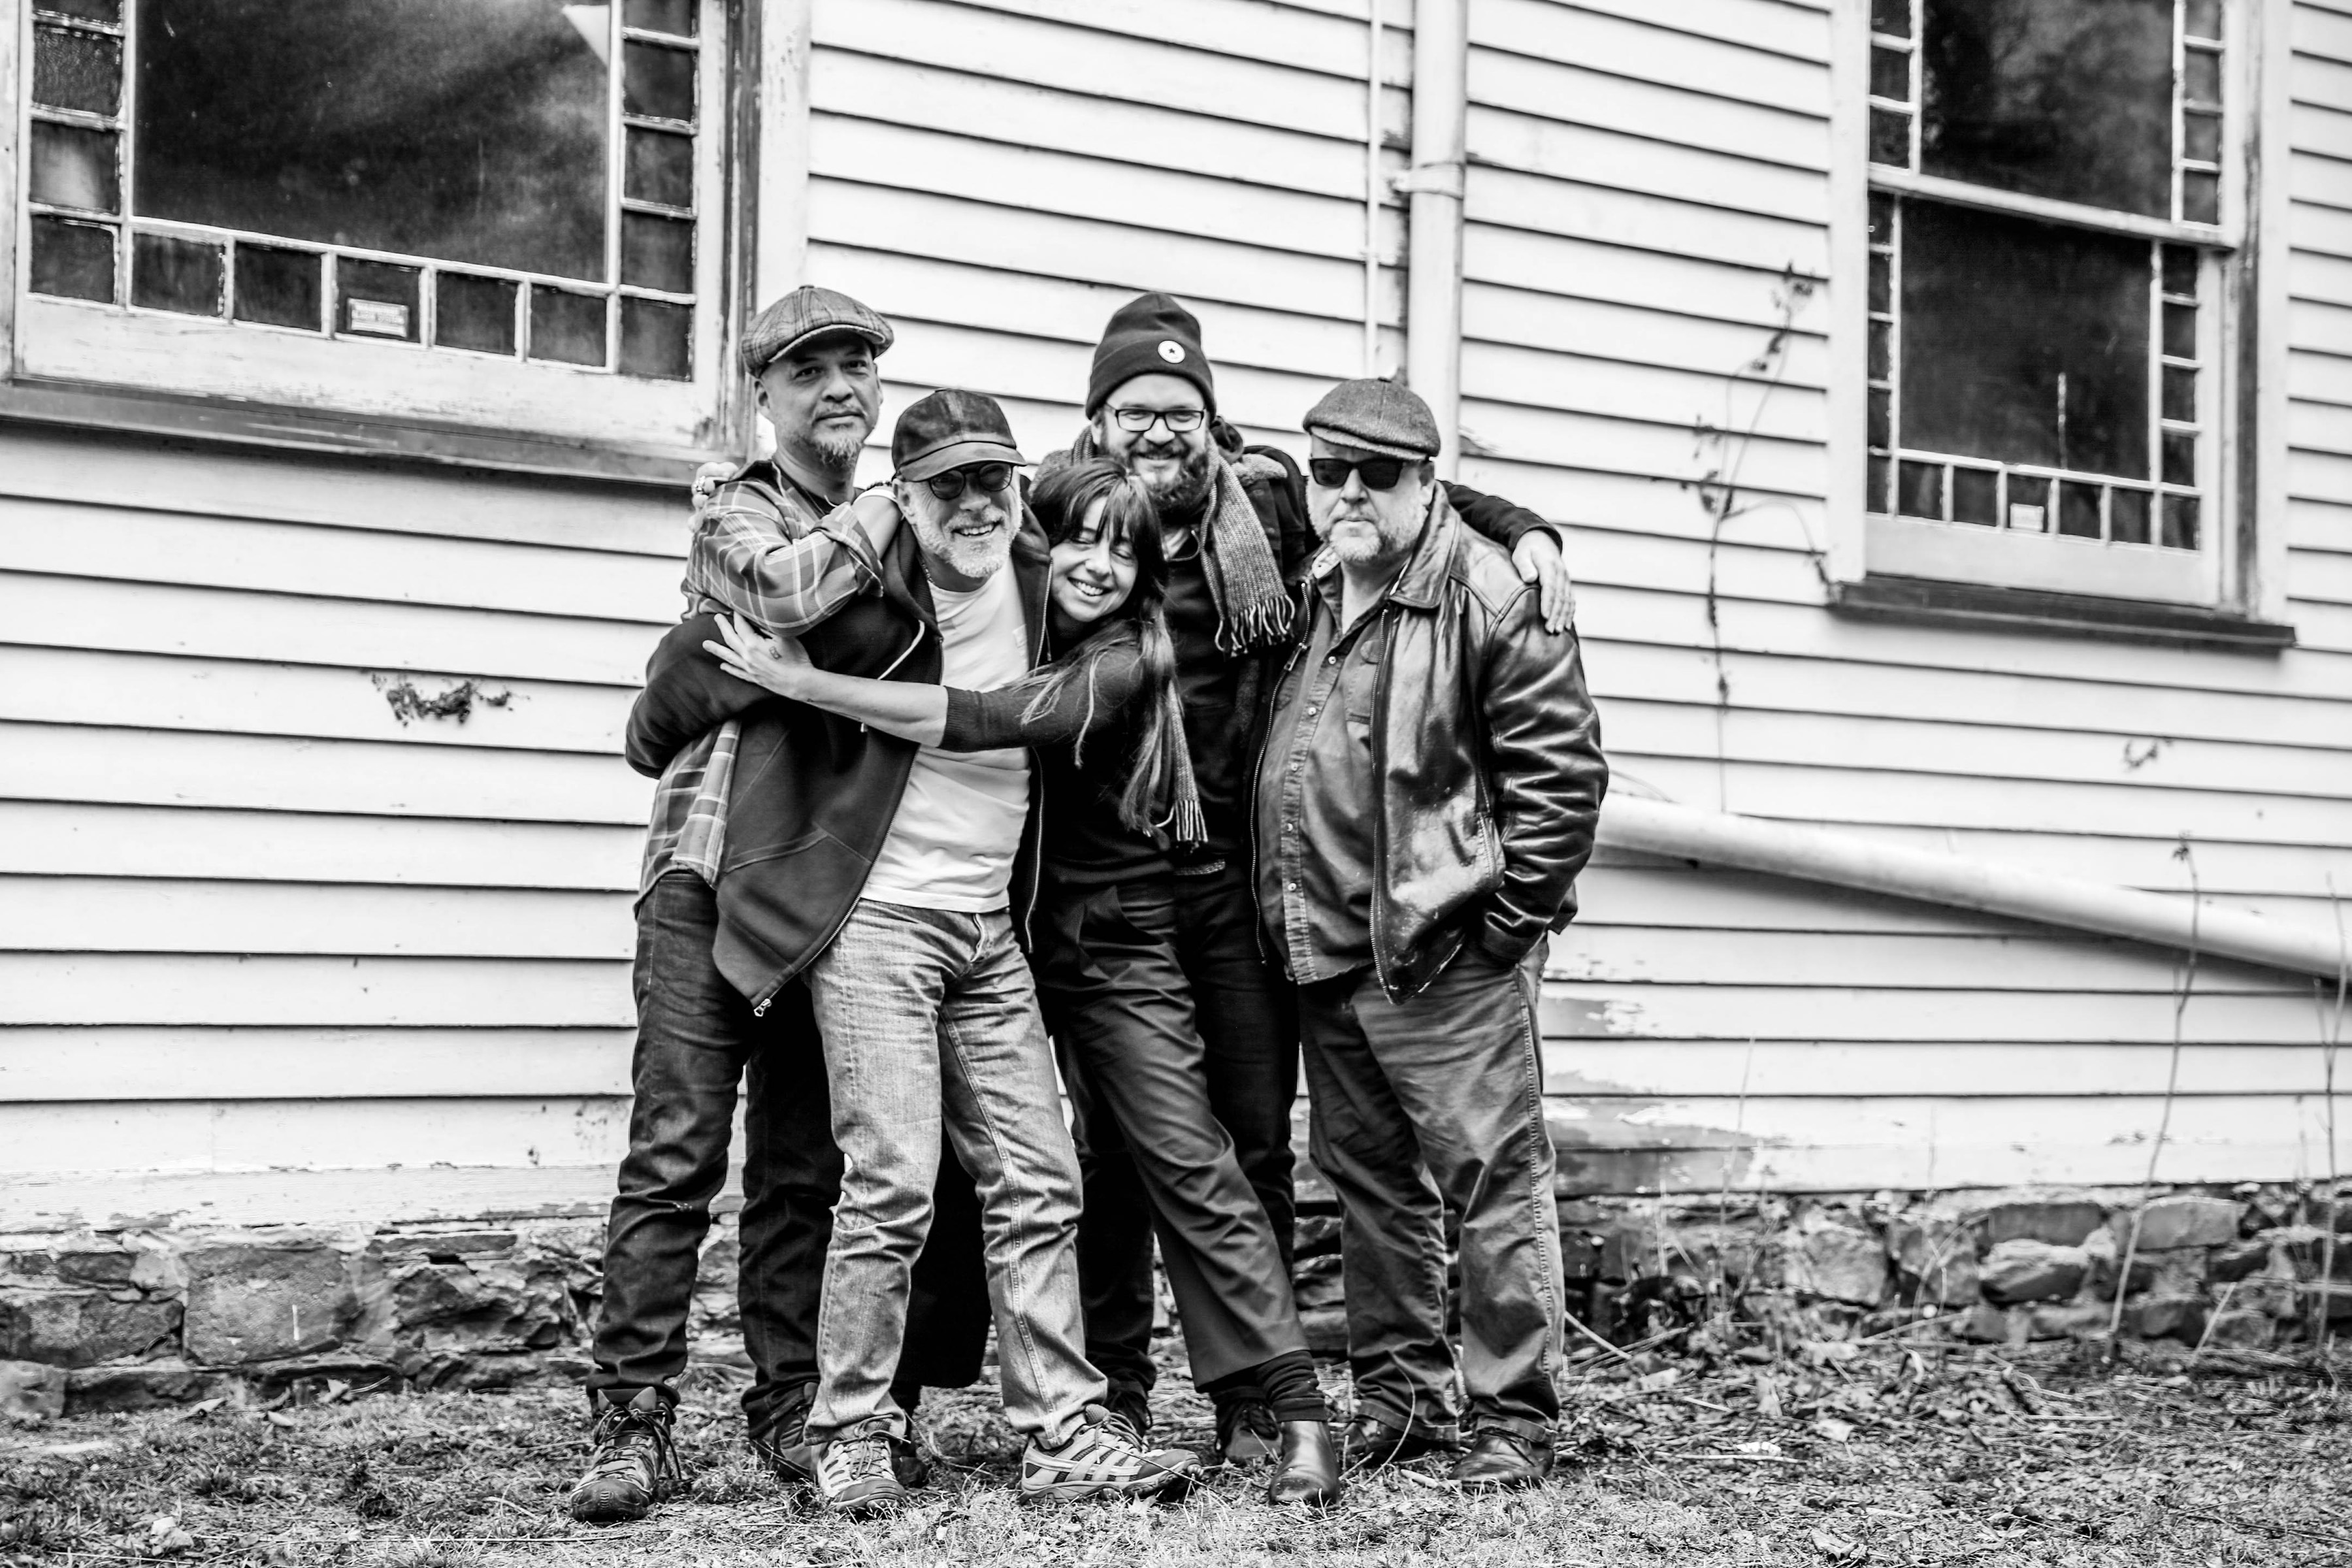 Pixies Prep New LP, Behind-the-Scenes Podcast Series